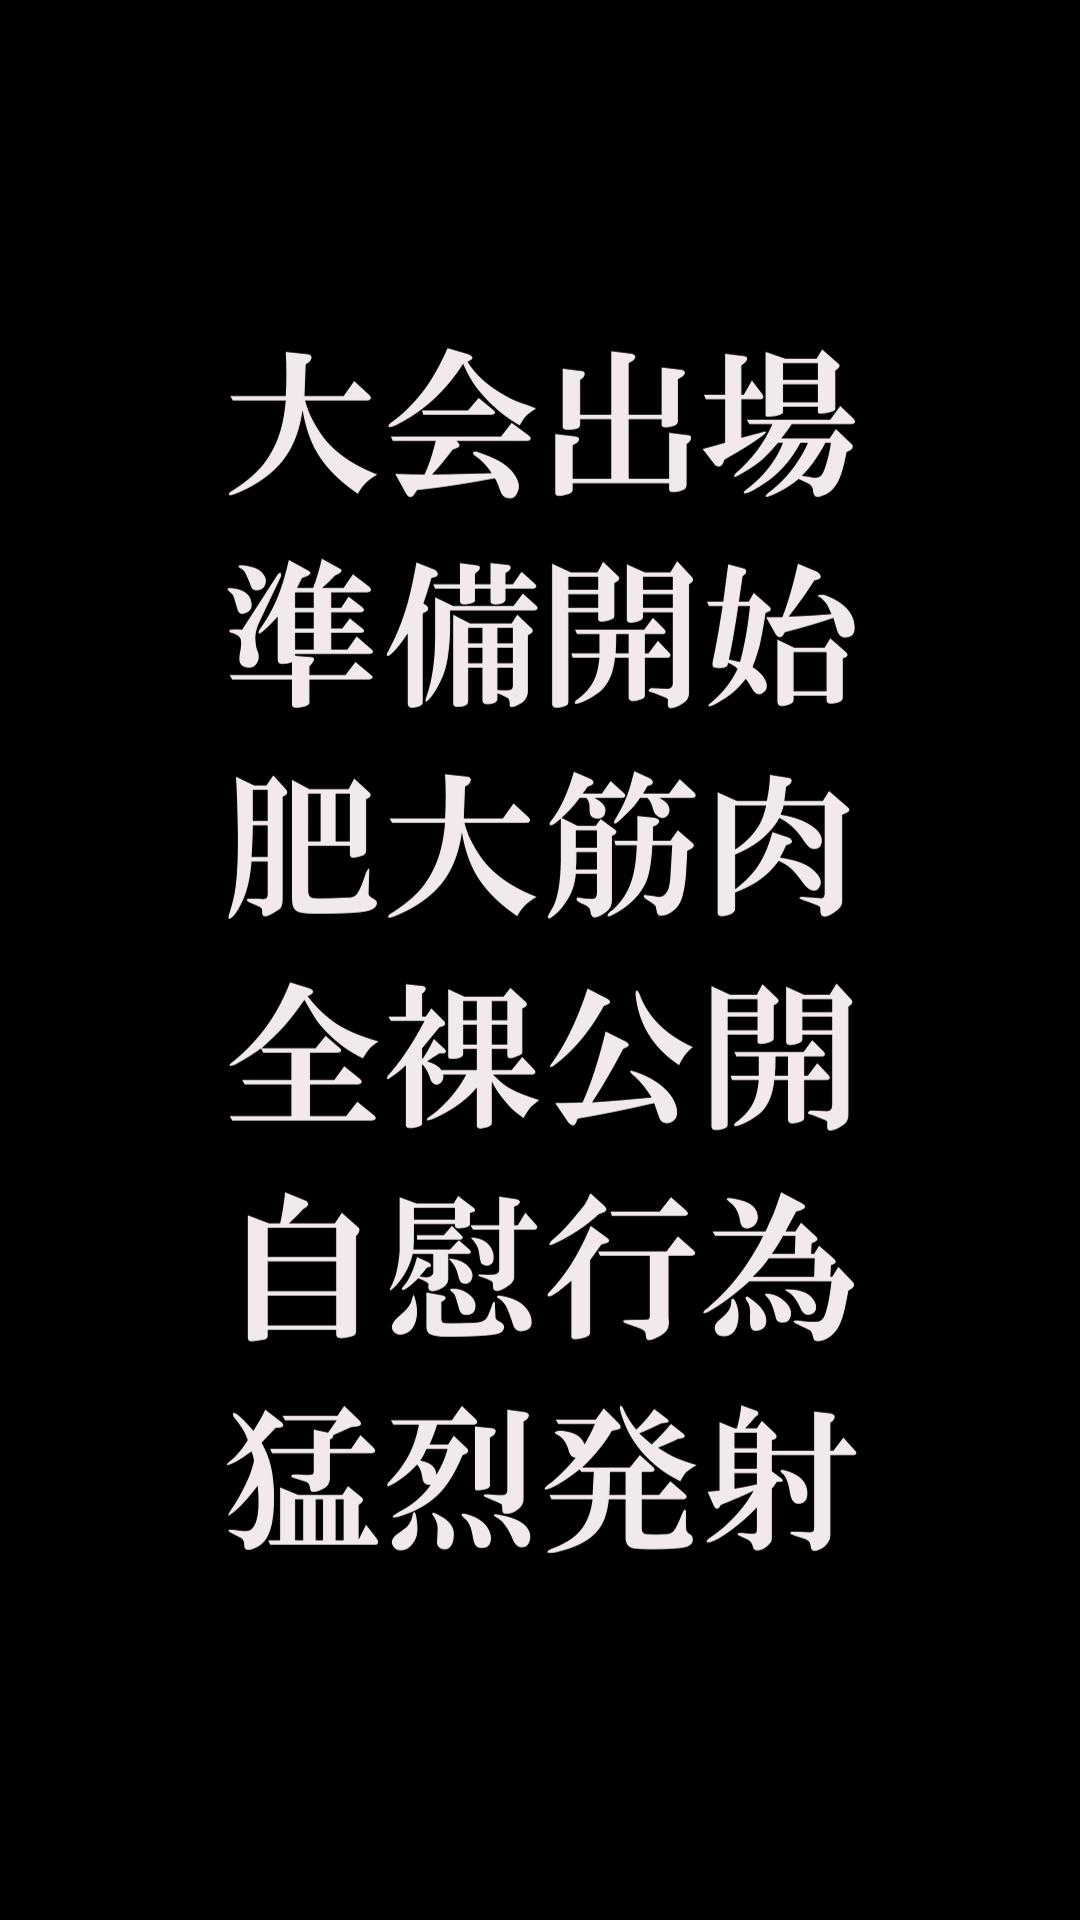 Goki-blog-023-magablo-32 (2)